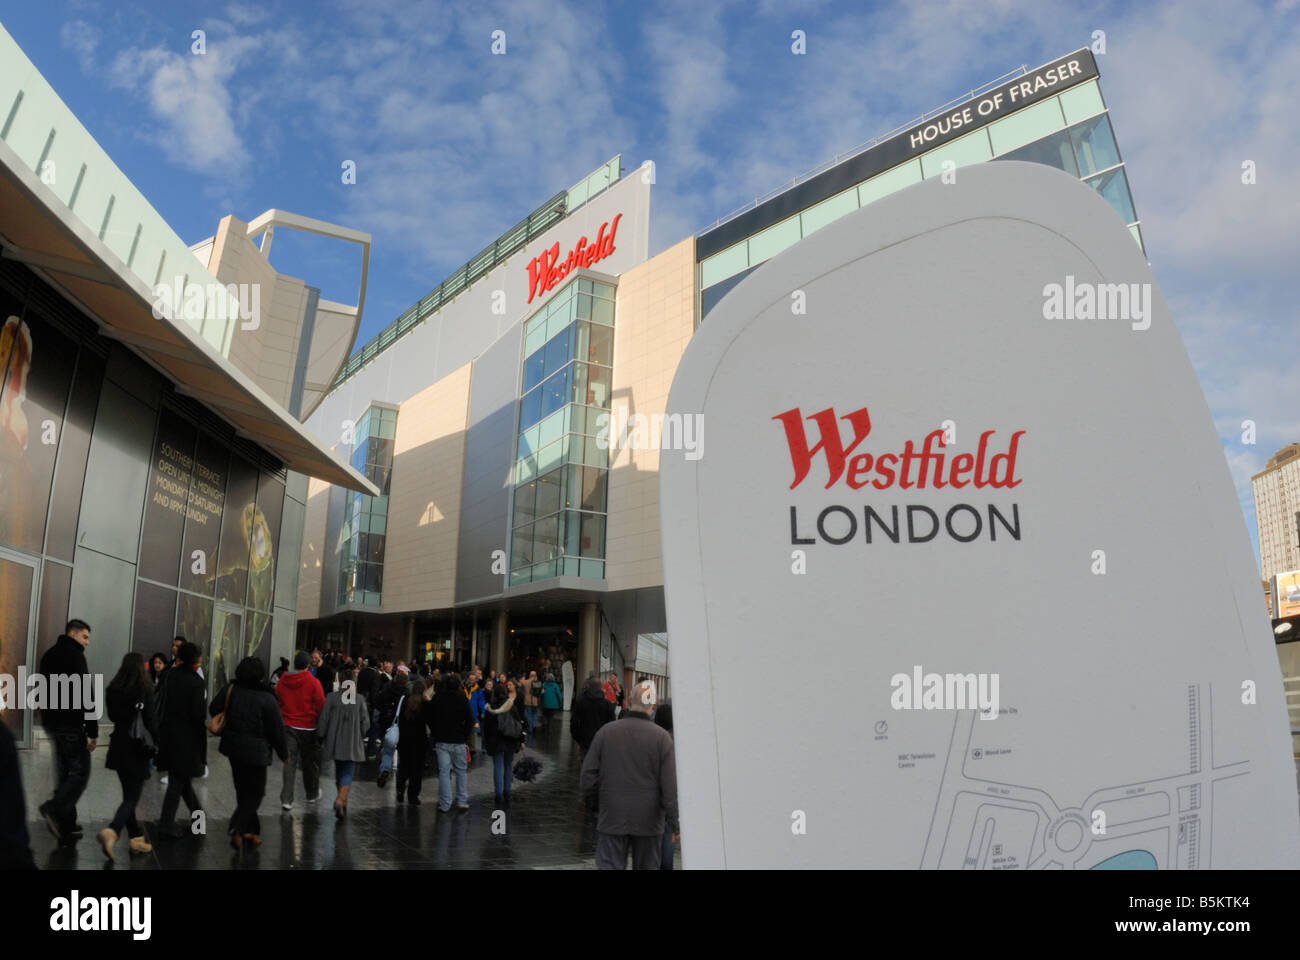 Westfield Shopping Centre, Shepherd's Bush, London - Stock Image